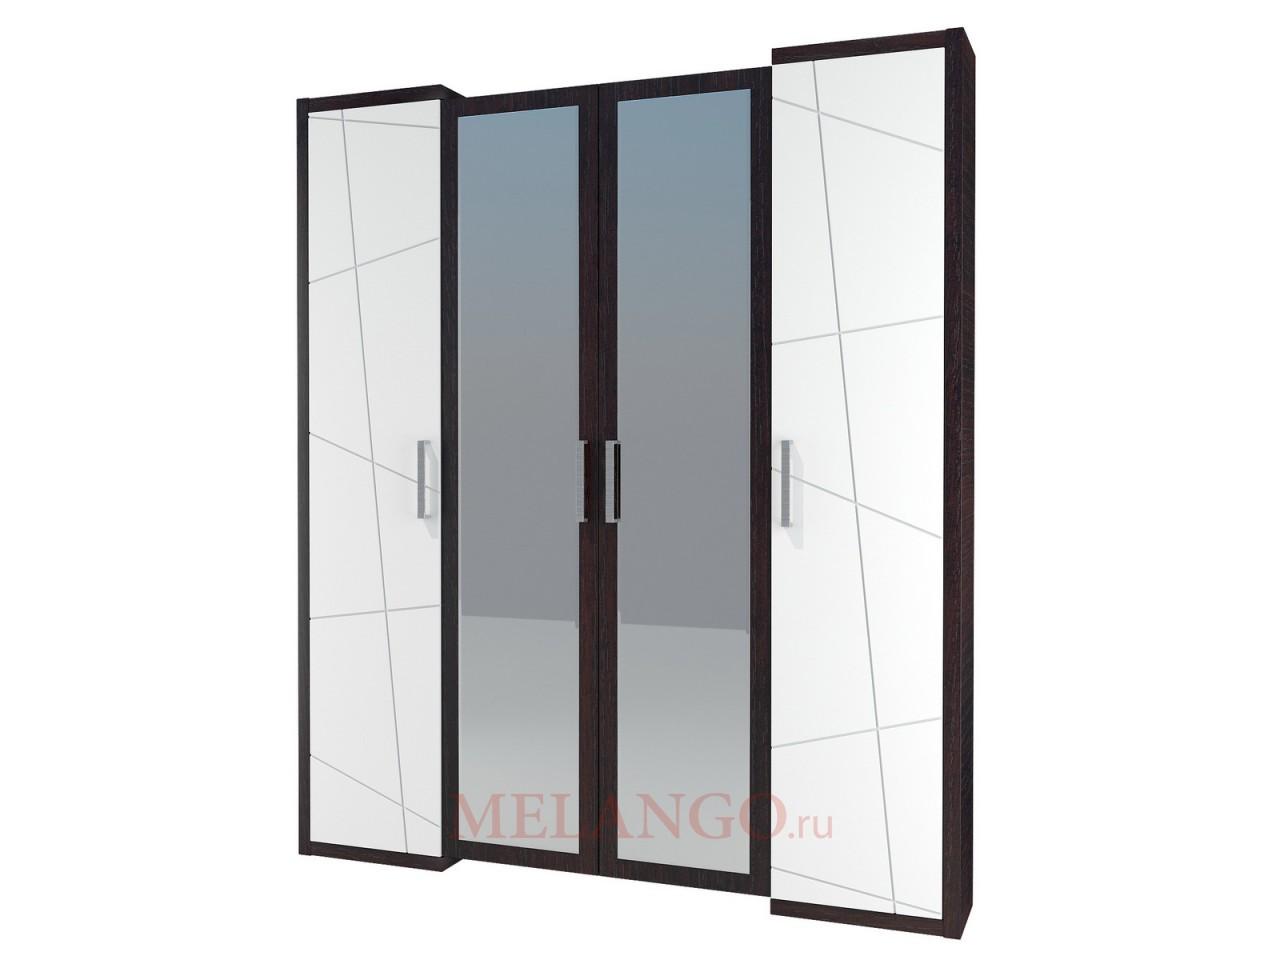 Четырехстворчатый шкаф гардероб для одежды с зеркалом Барселона МН-115-04